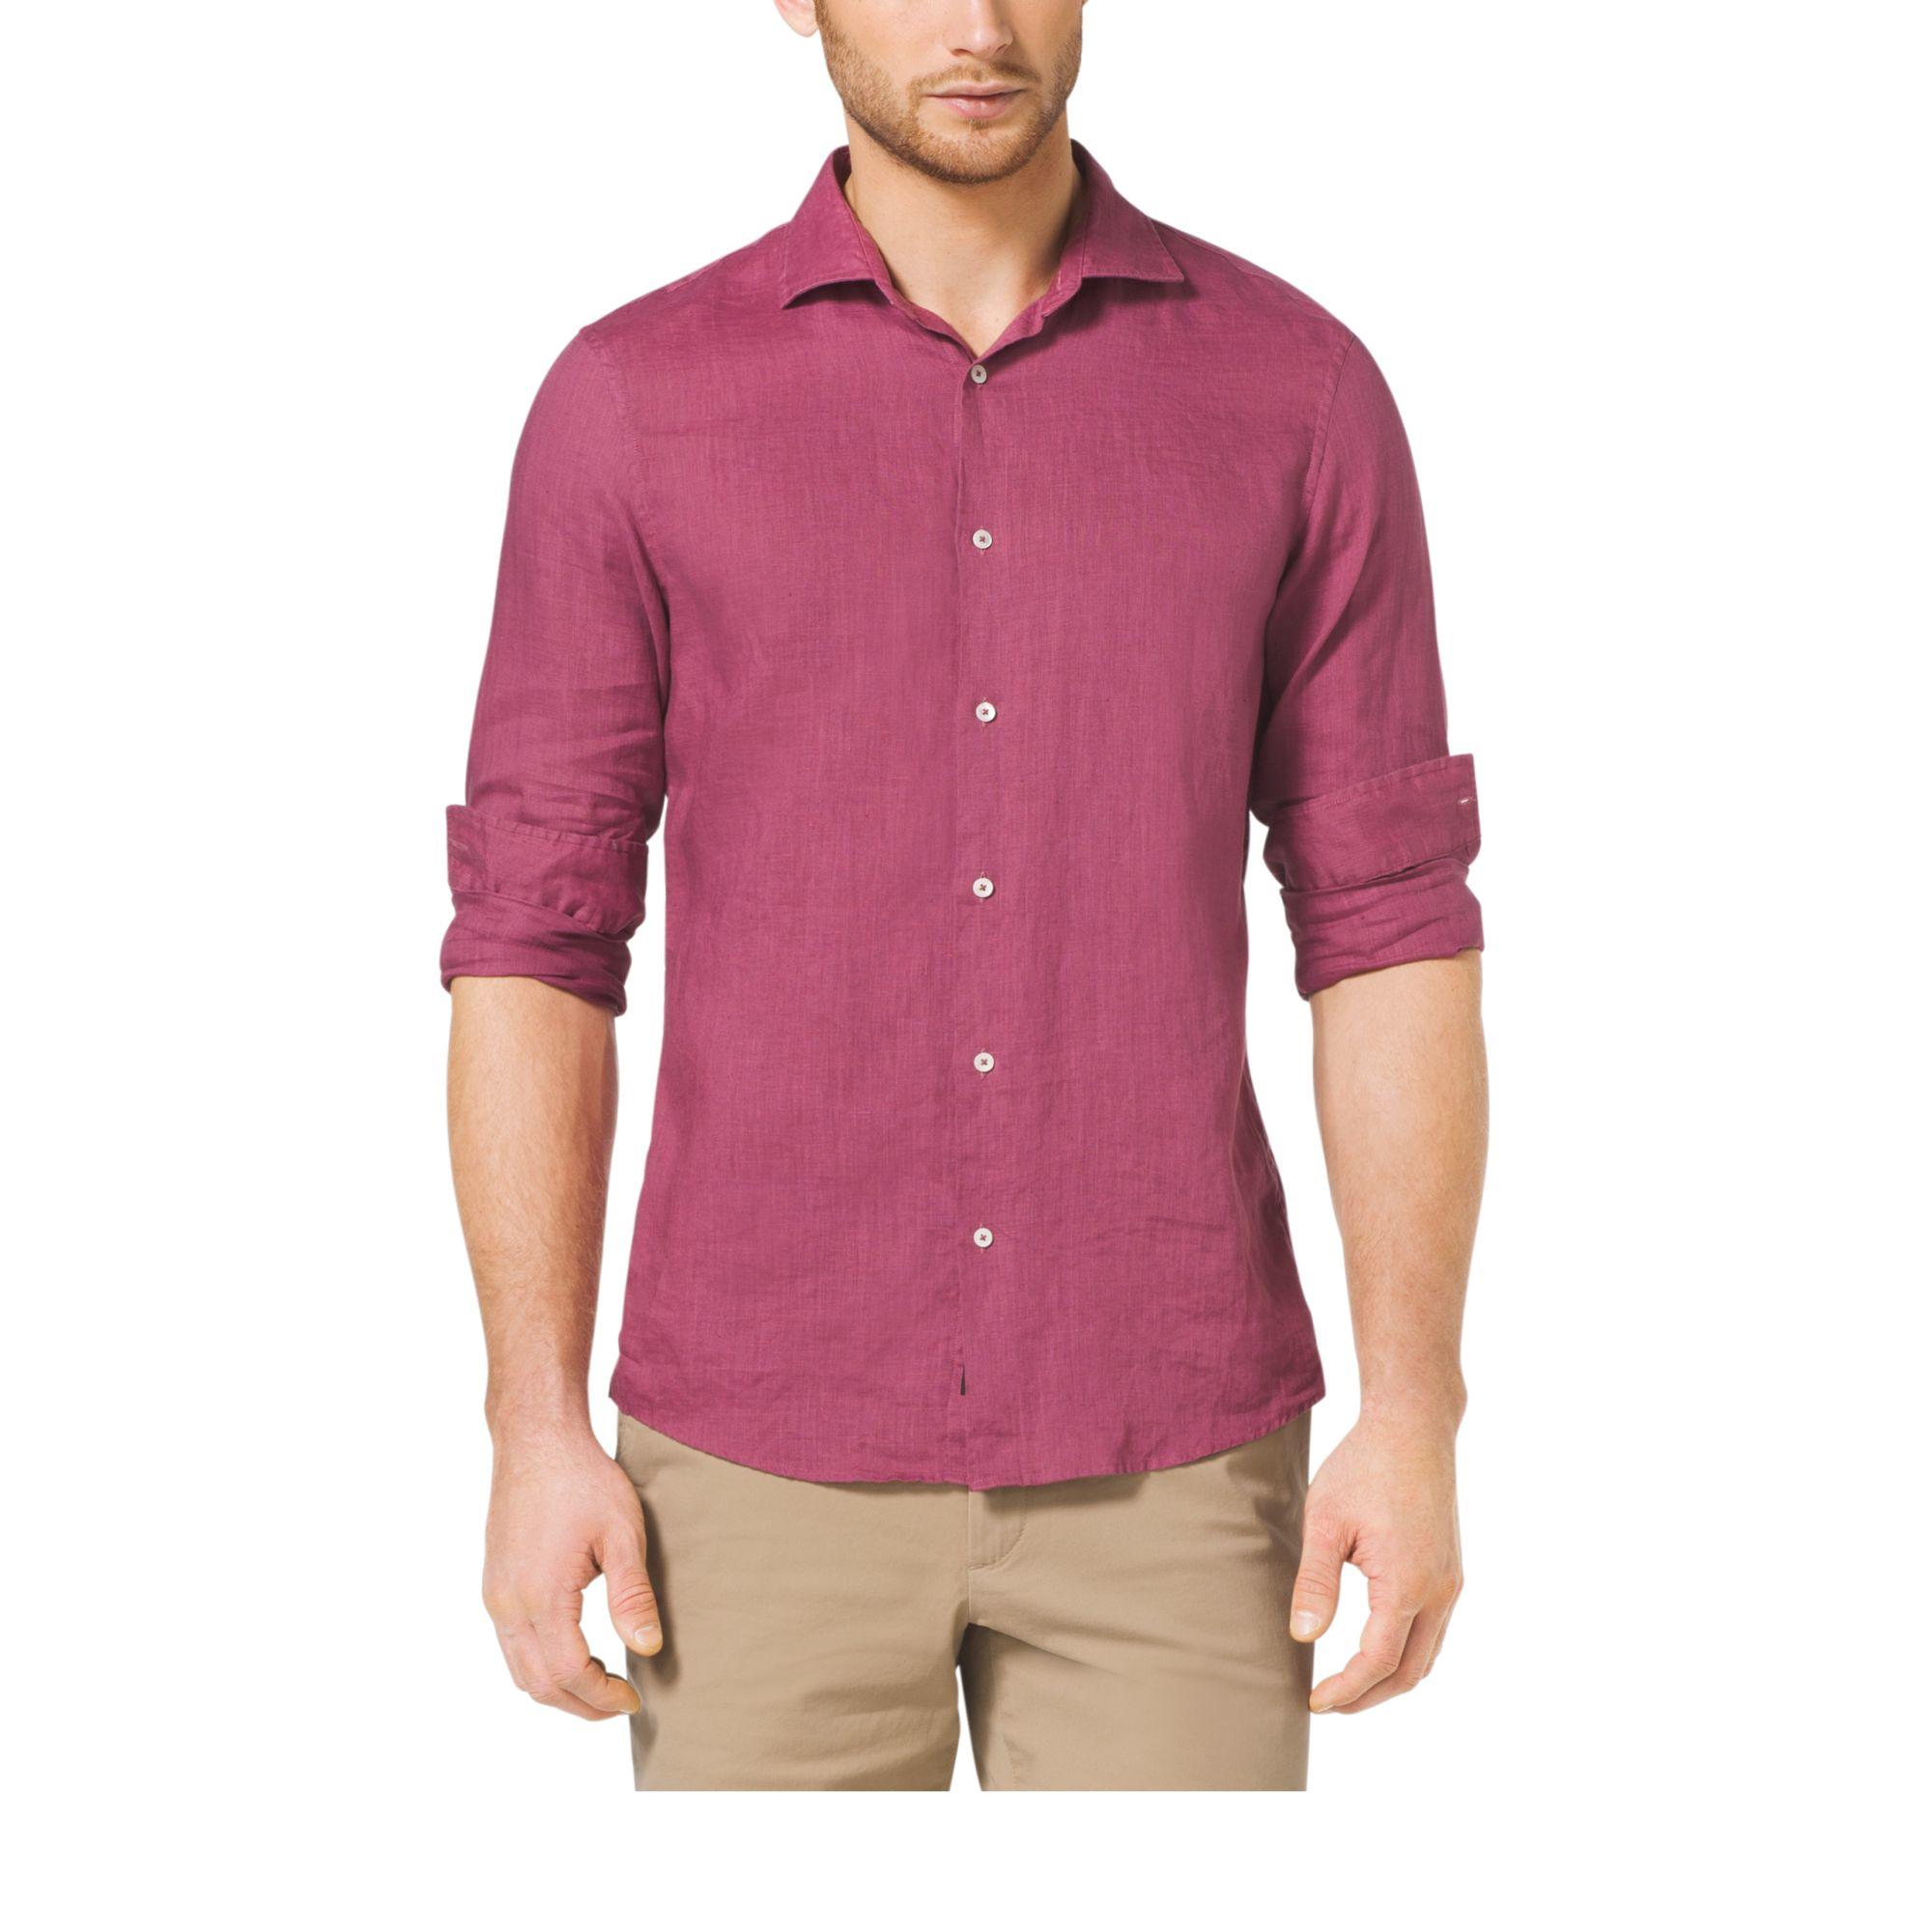 Michael kors Slim-fit Linen Shirt in Pink for Men   Lyst